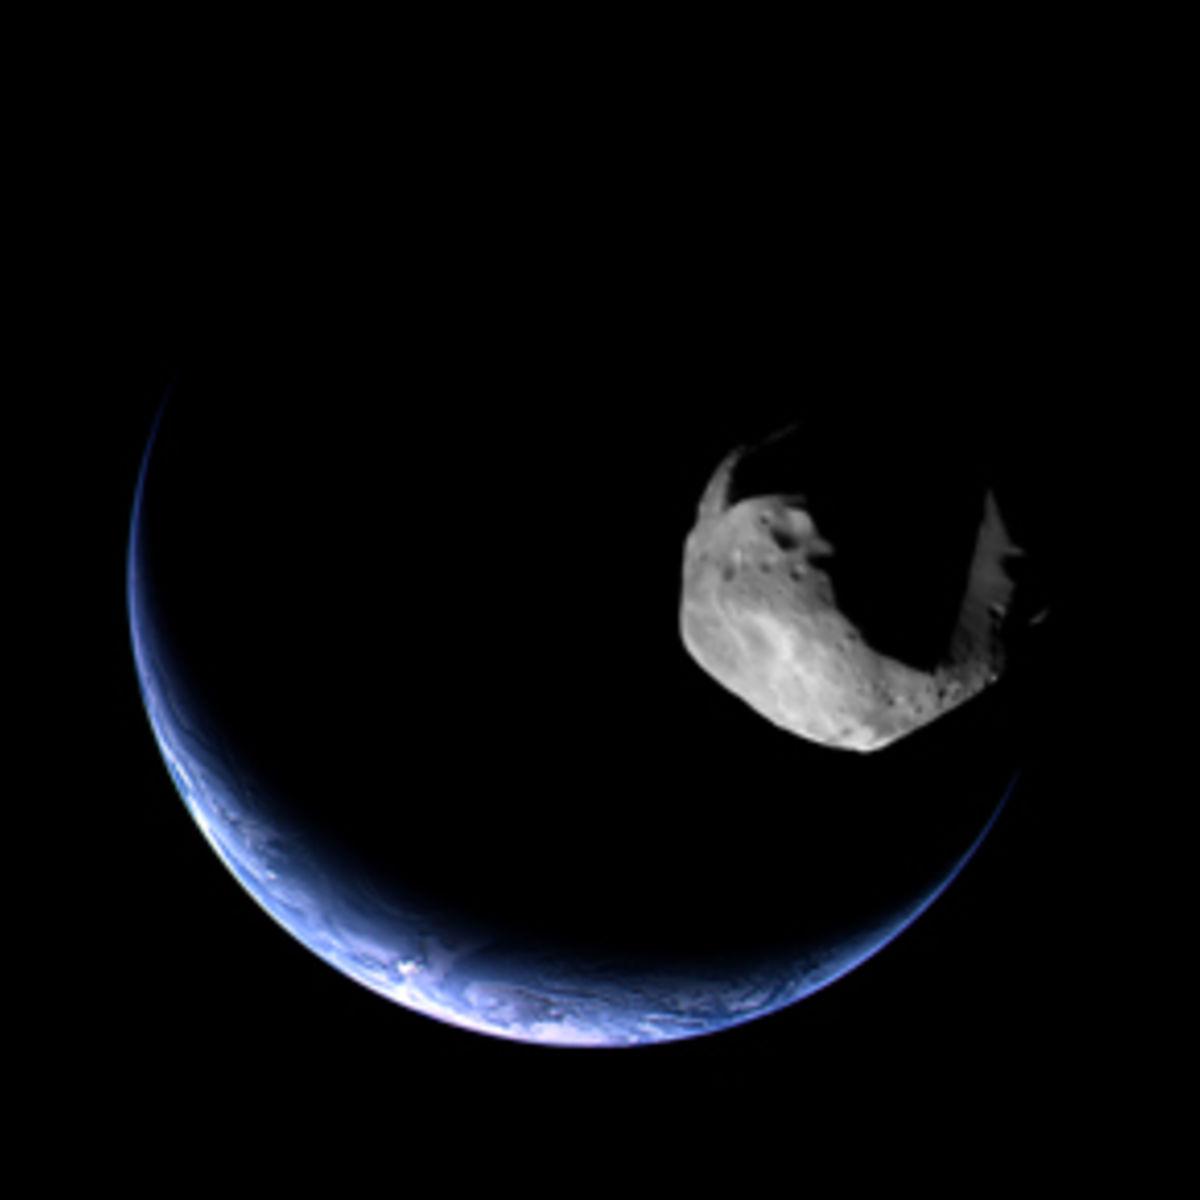 near_earth_asteroid_icon_2.jpg